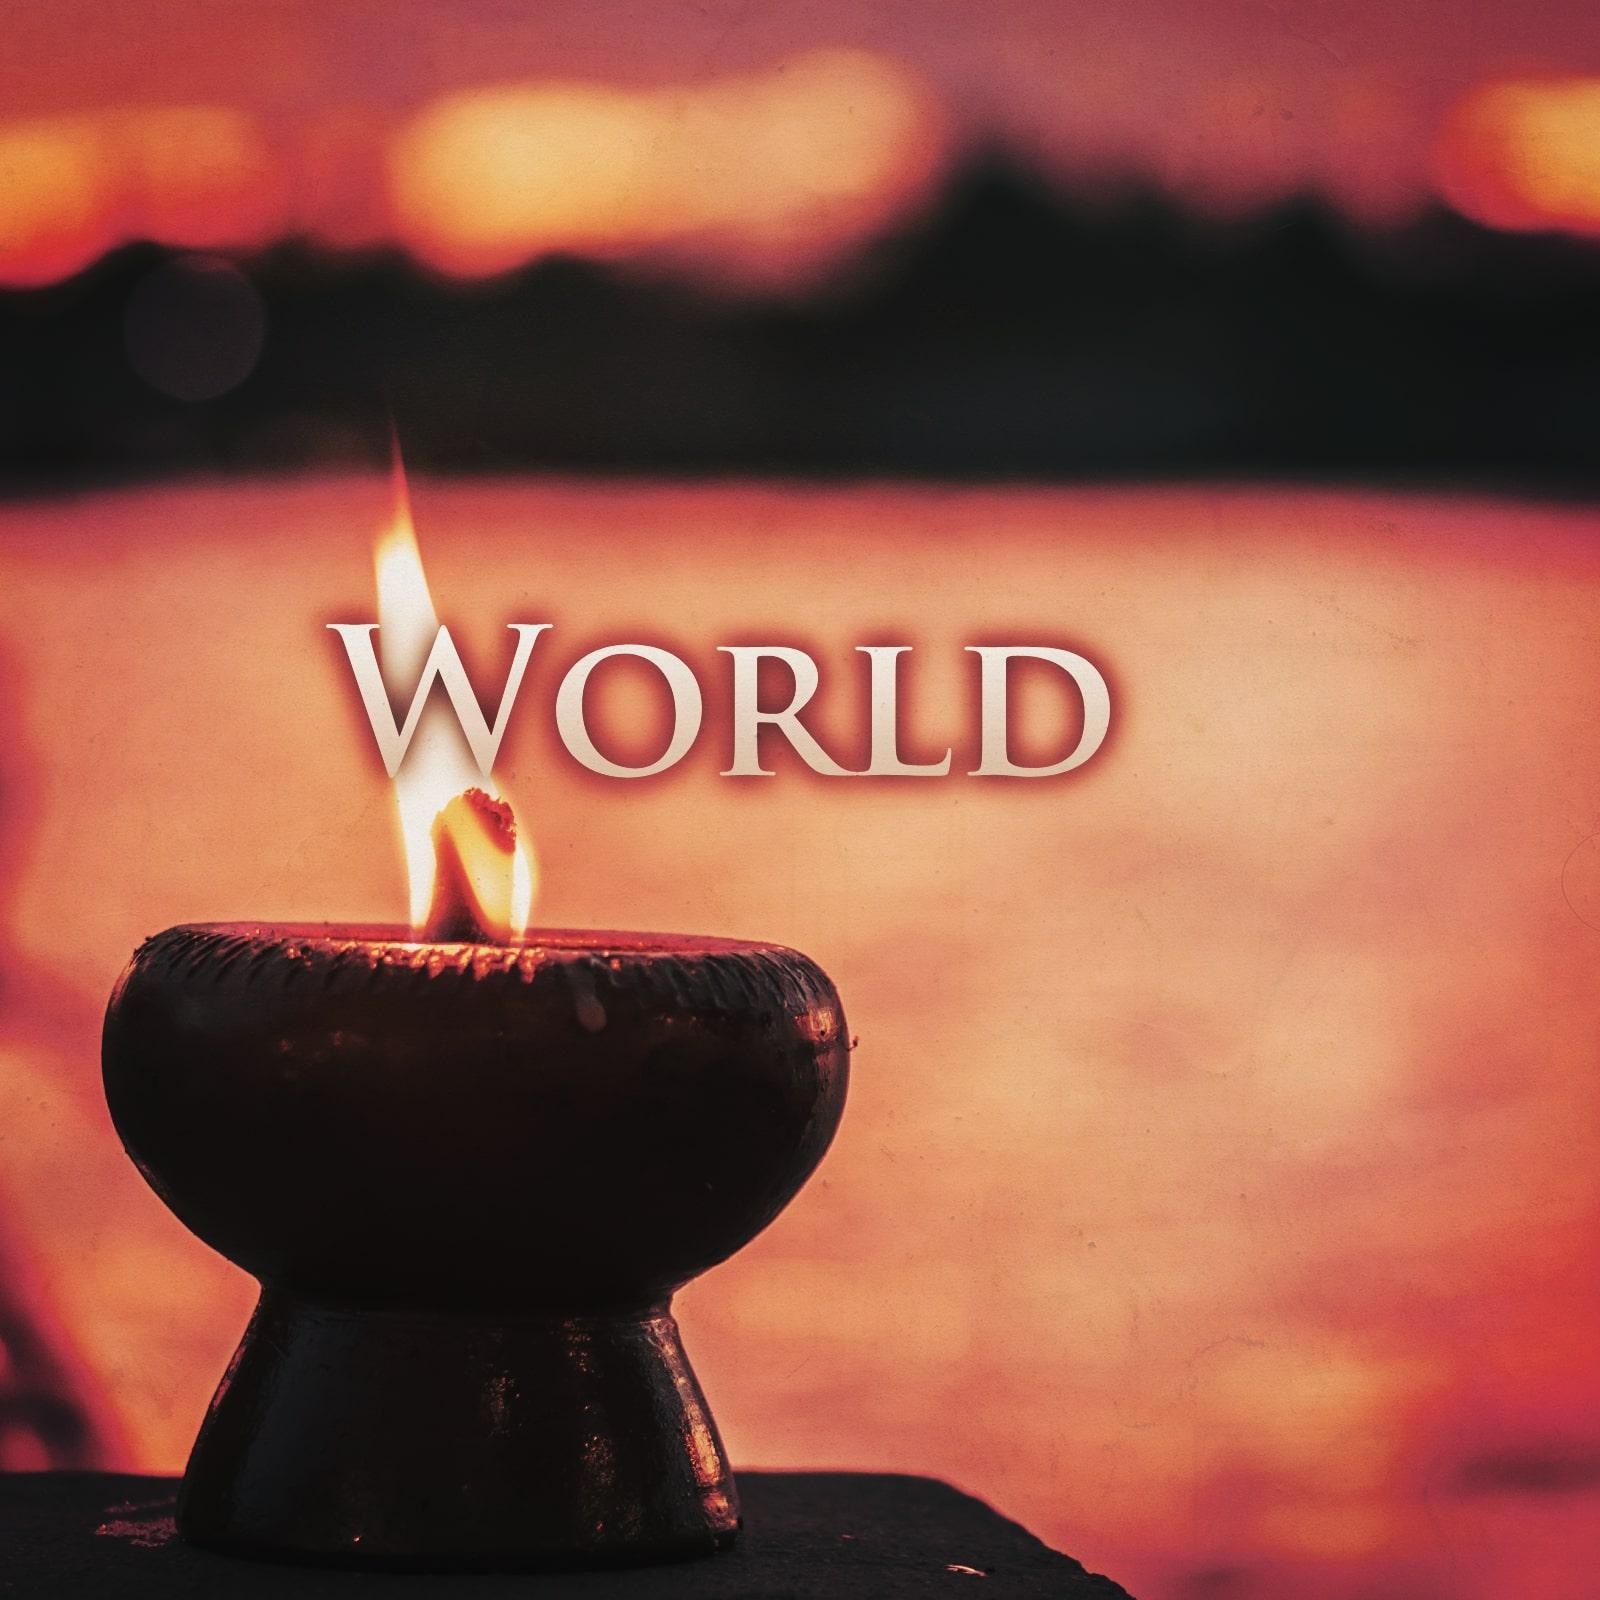 WORLD_OVERALL.jpg